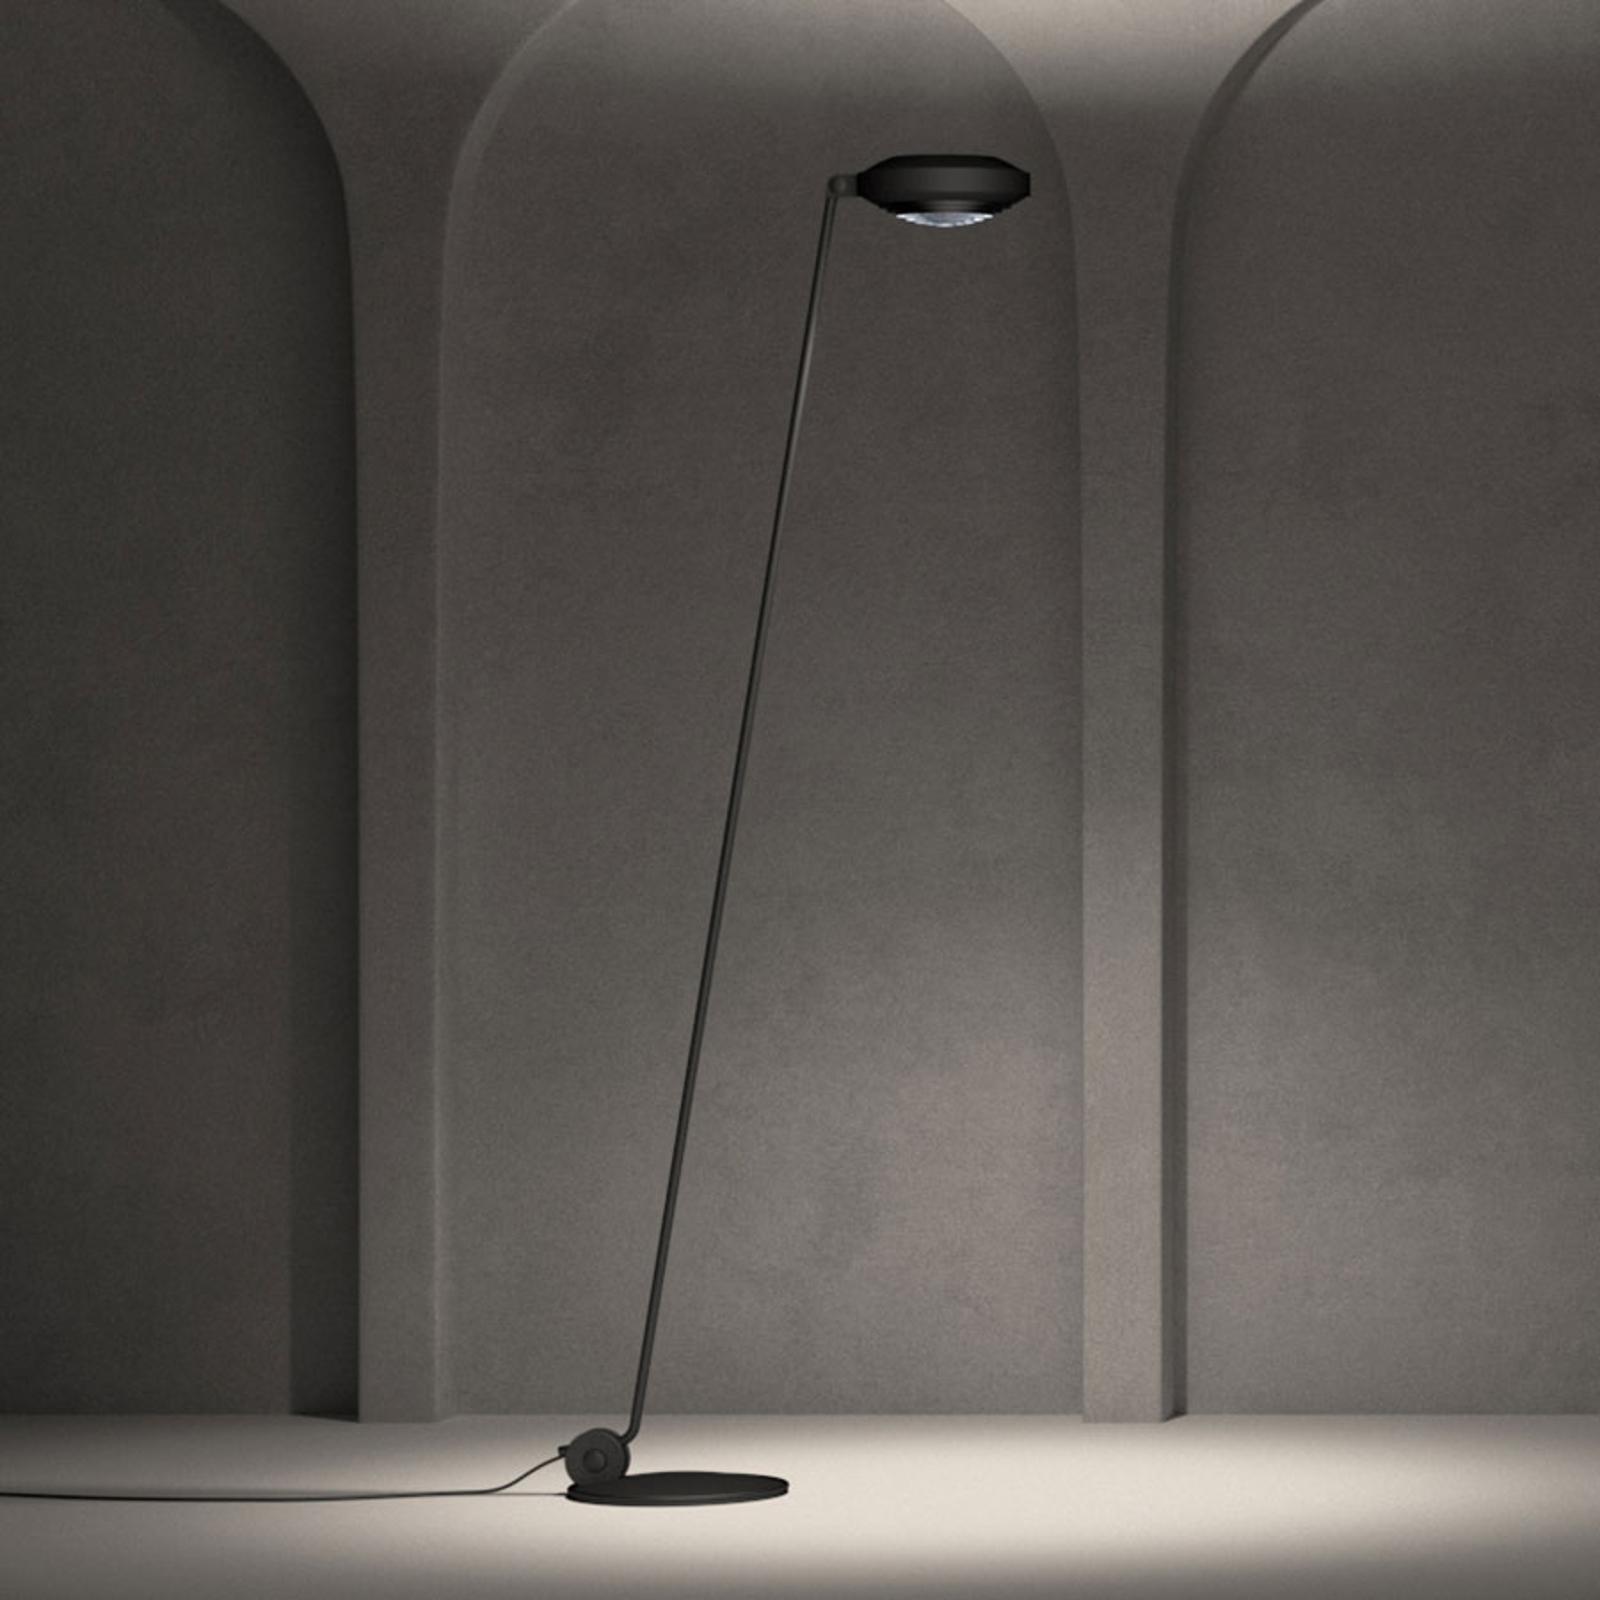 Lumina Elle 1 LED-Stehlampe H 180cm 3.000K schwarz